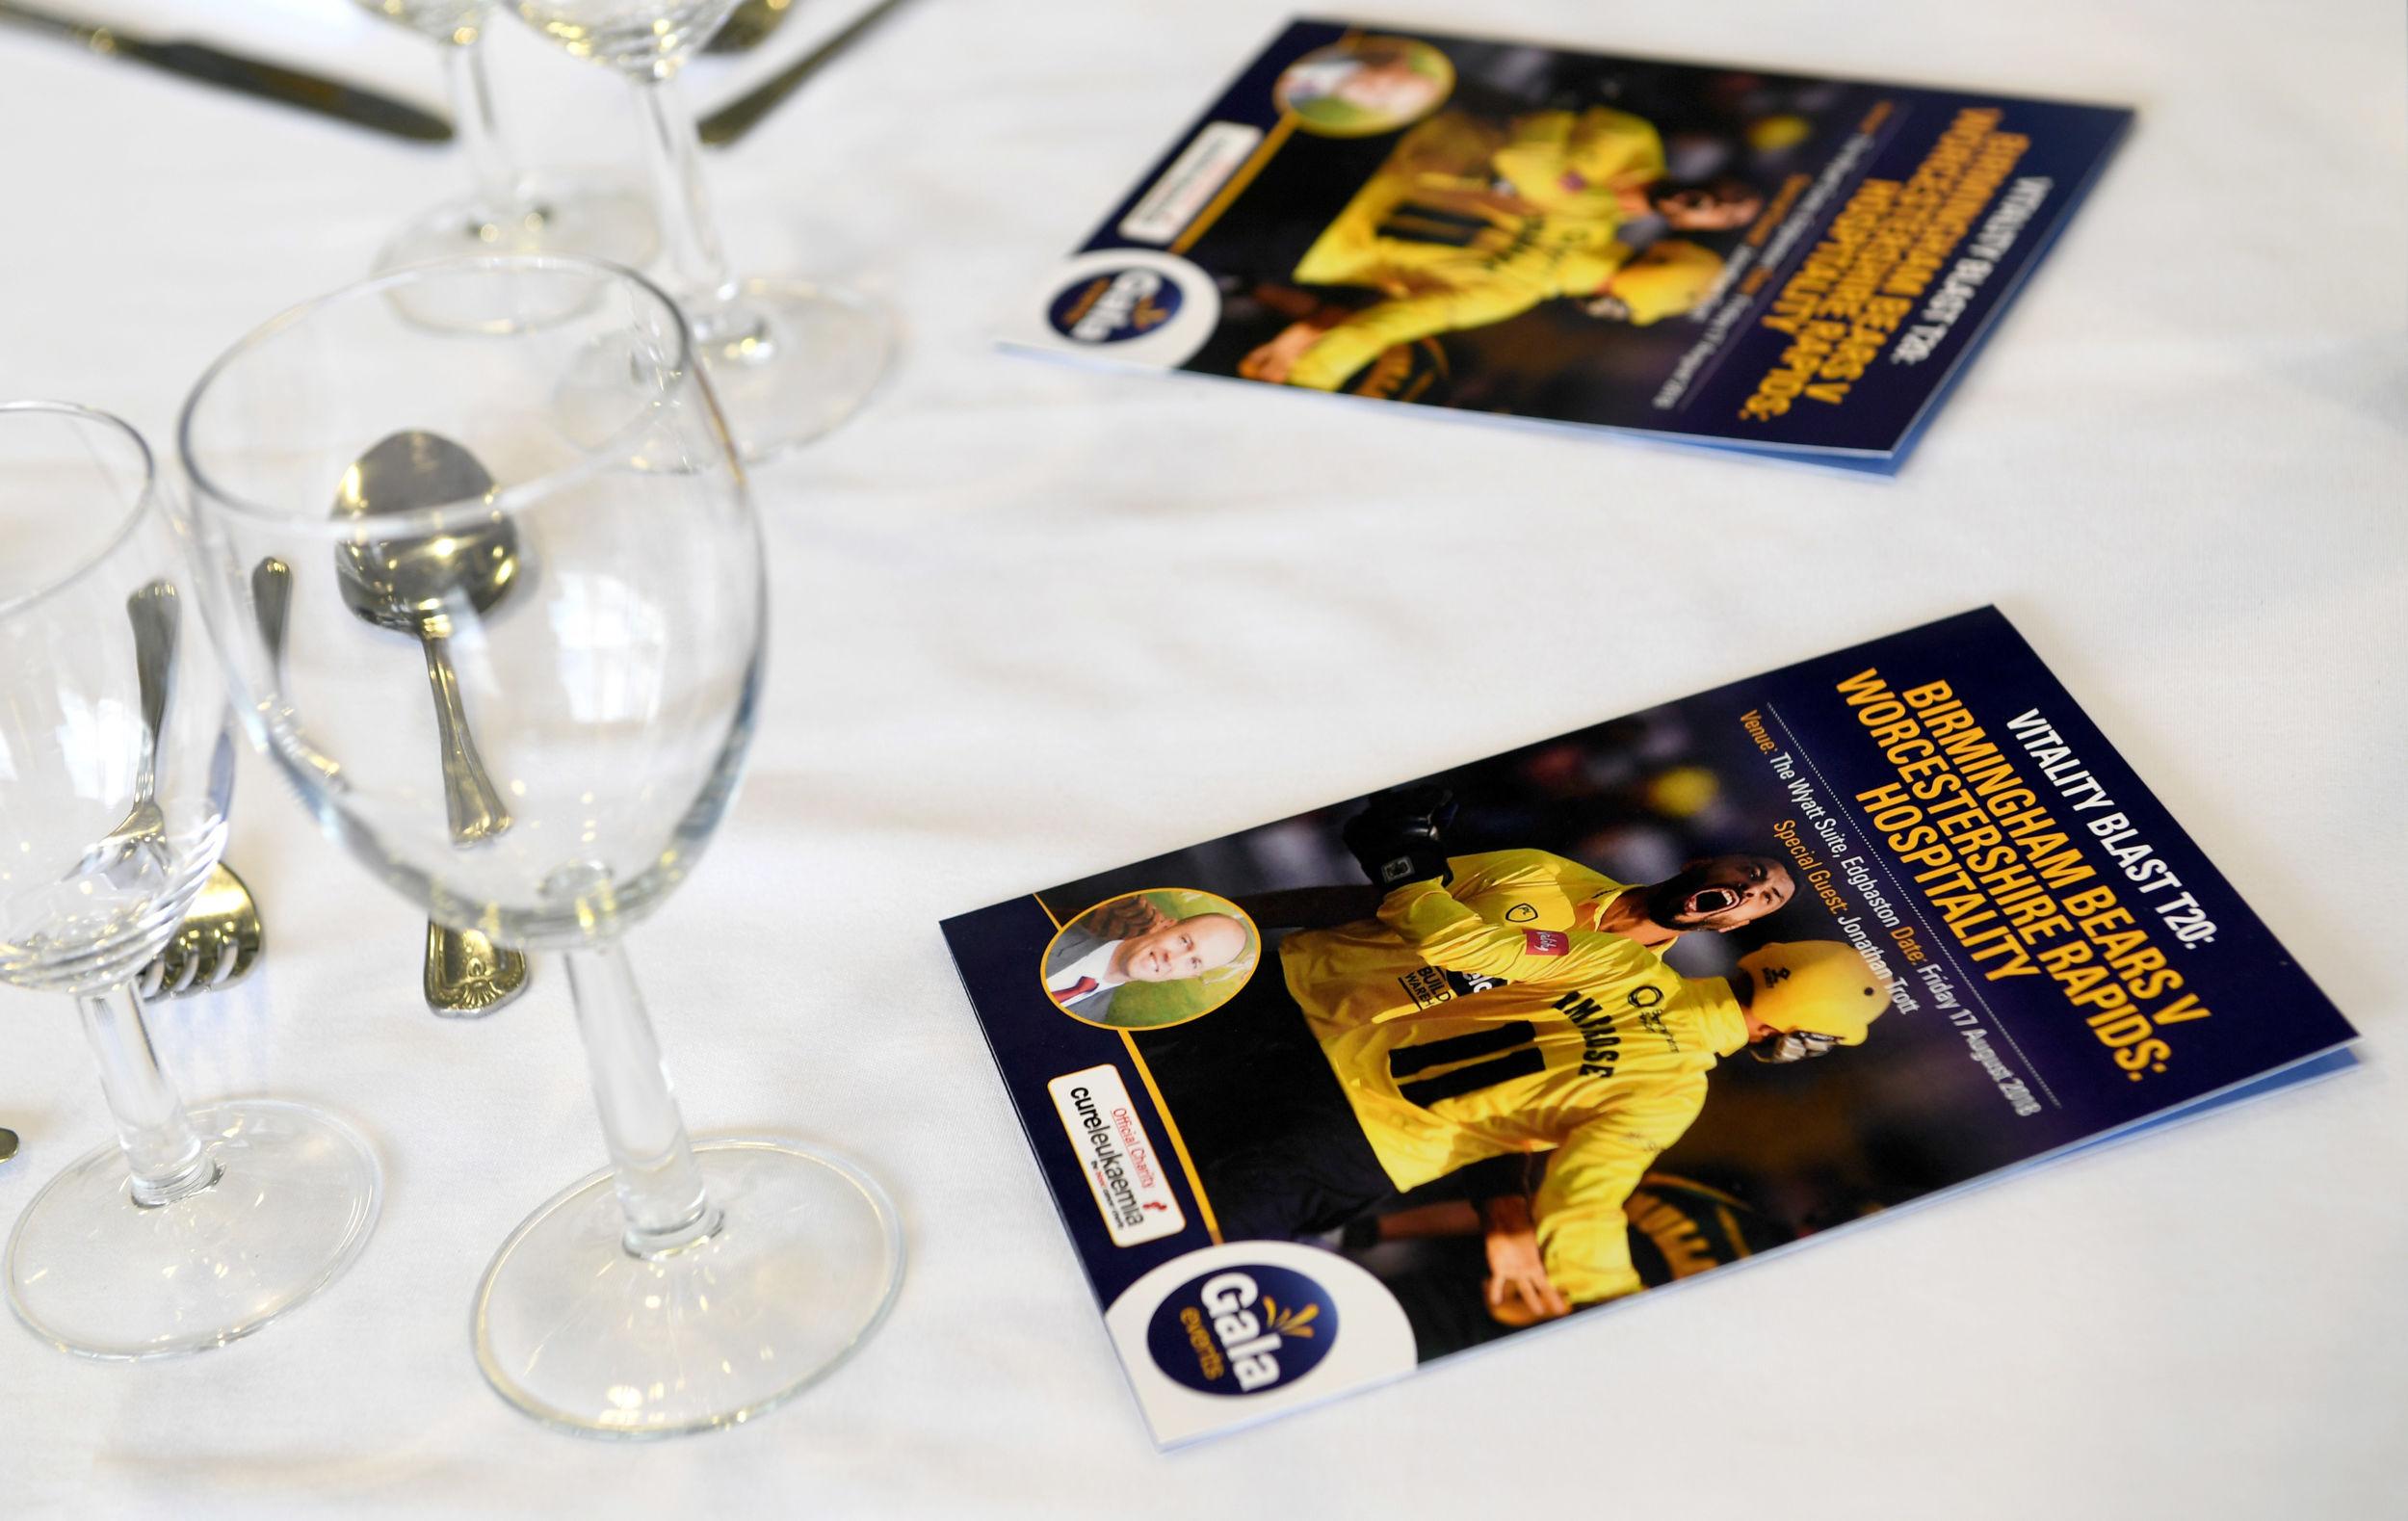 Birmingham Bears T20 Blast at Edgbaston 2020 | Gala Hospitality